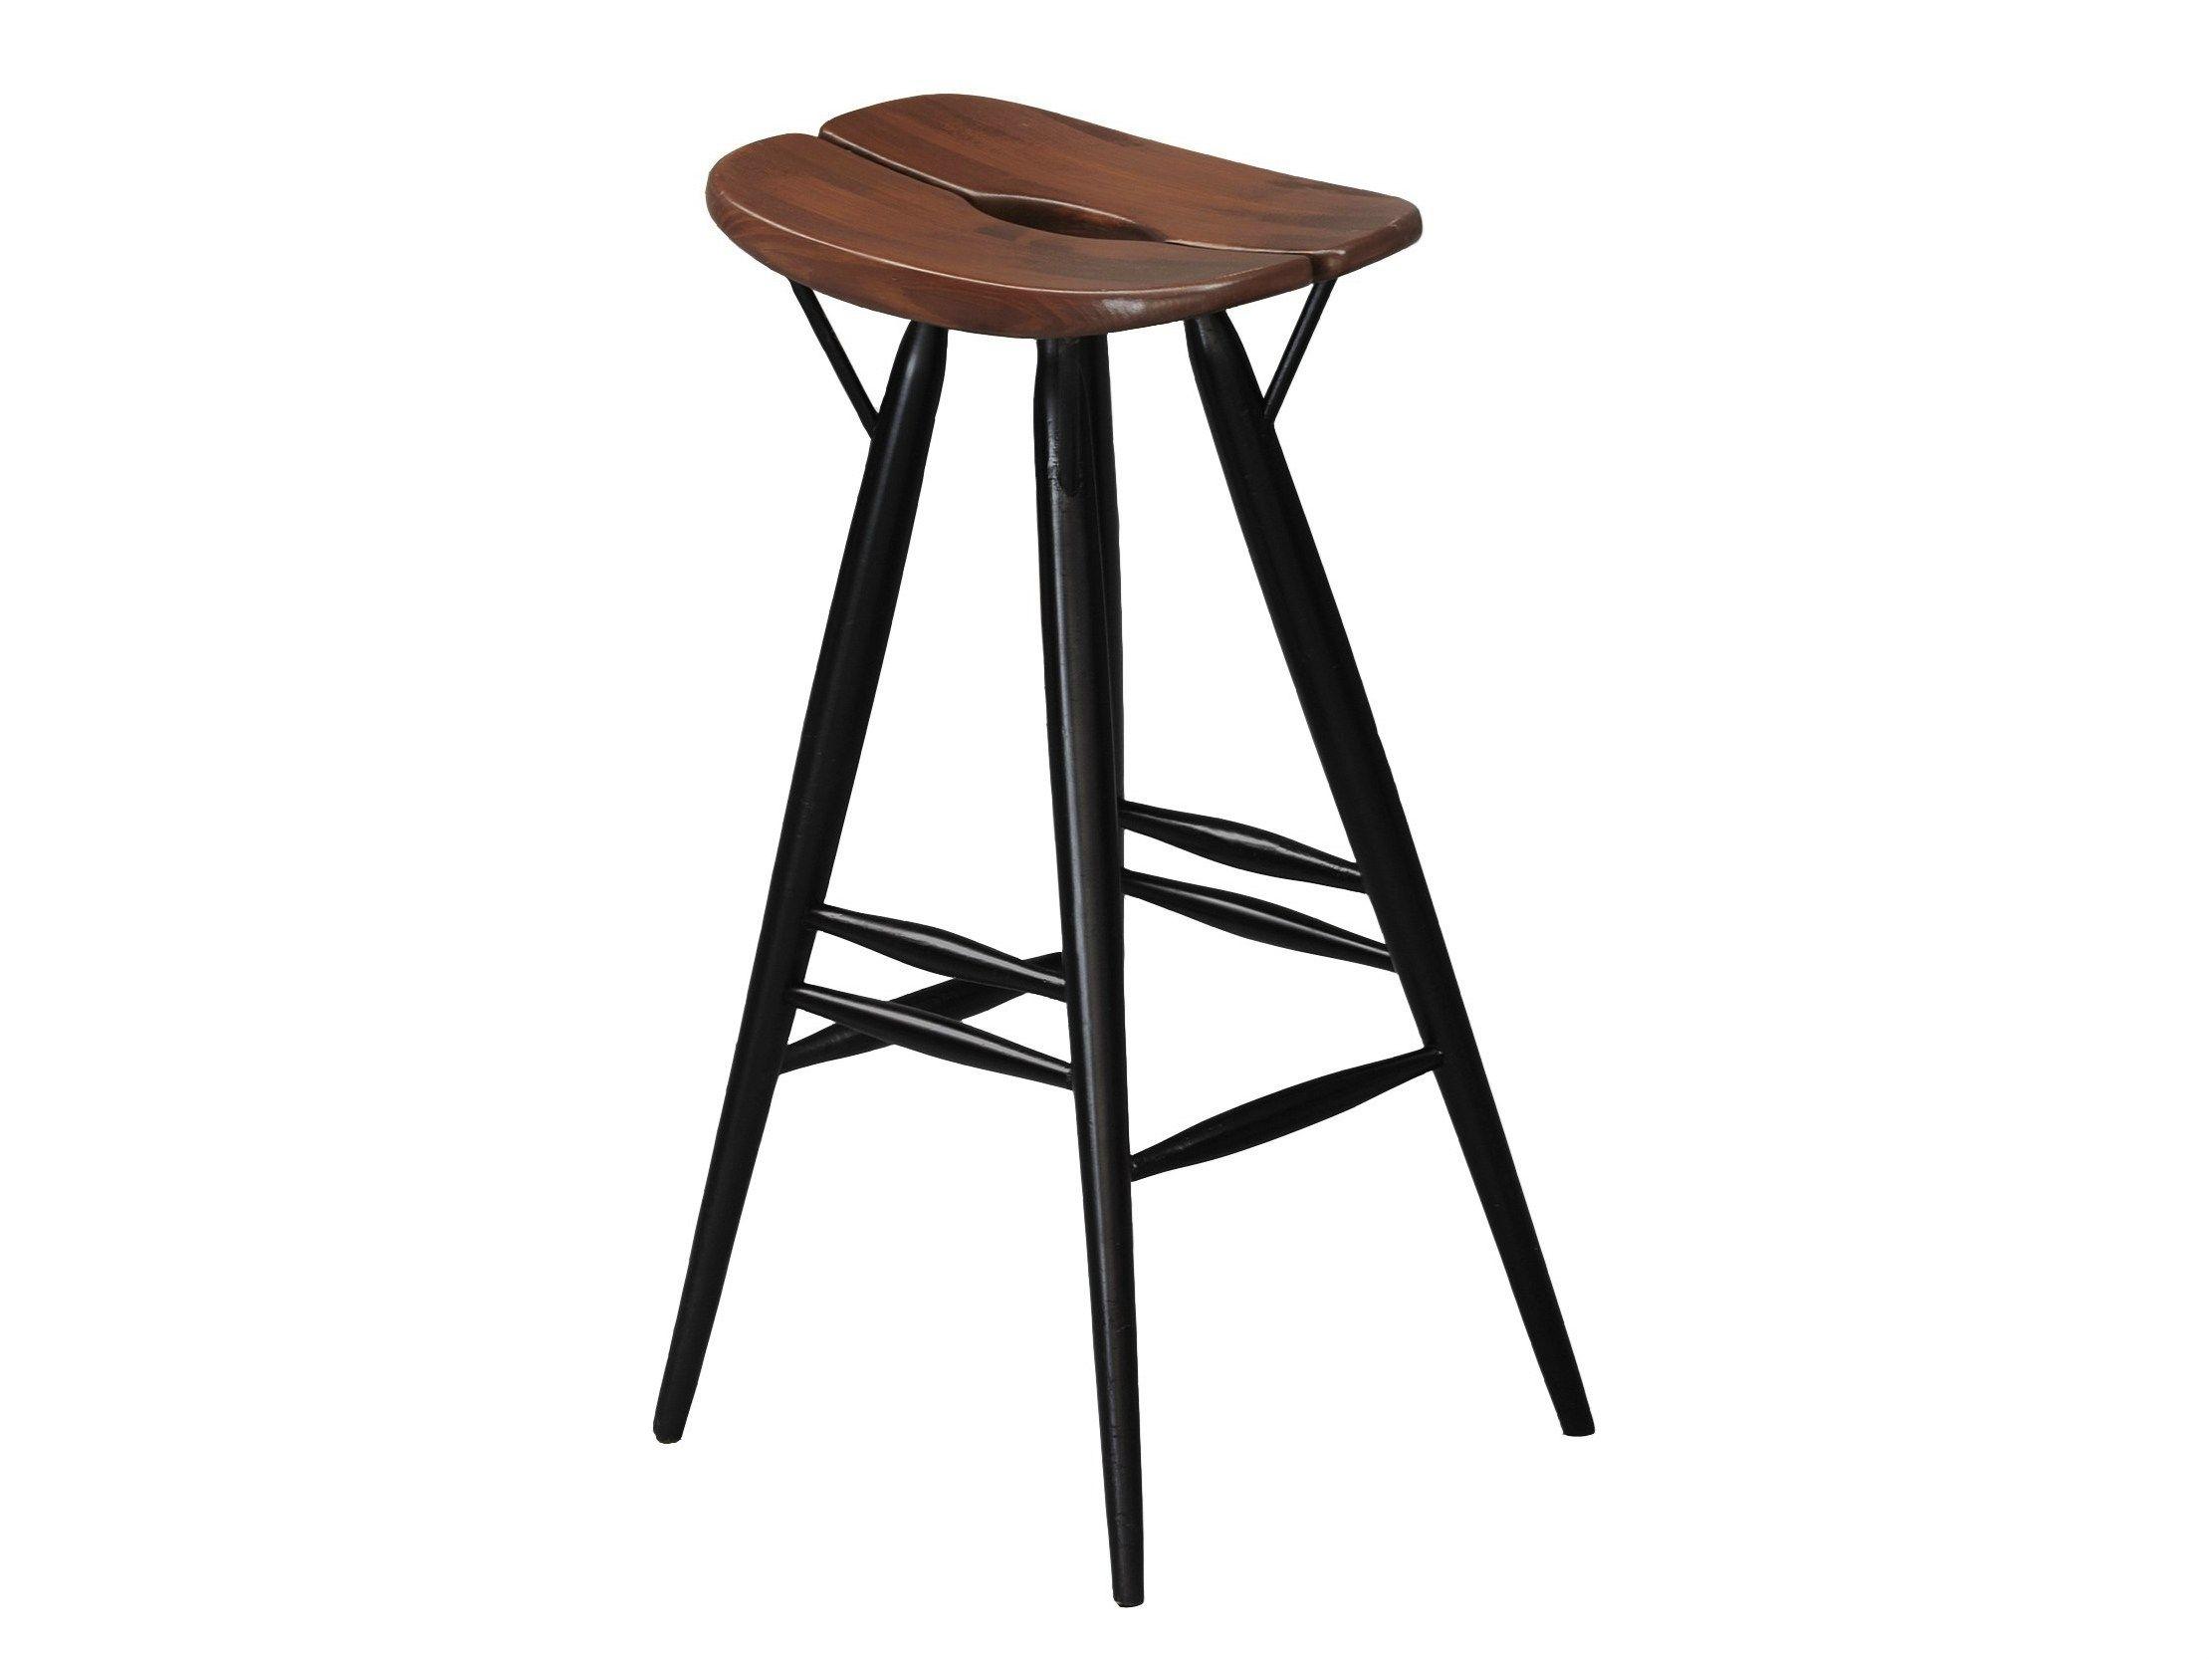 #6F4636 High Wooden Barstool PIRKKA High Stool Artek with 2222x1666 px of Brand New High Wooden Stool 16662222 pic @ avoidforclosure.info